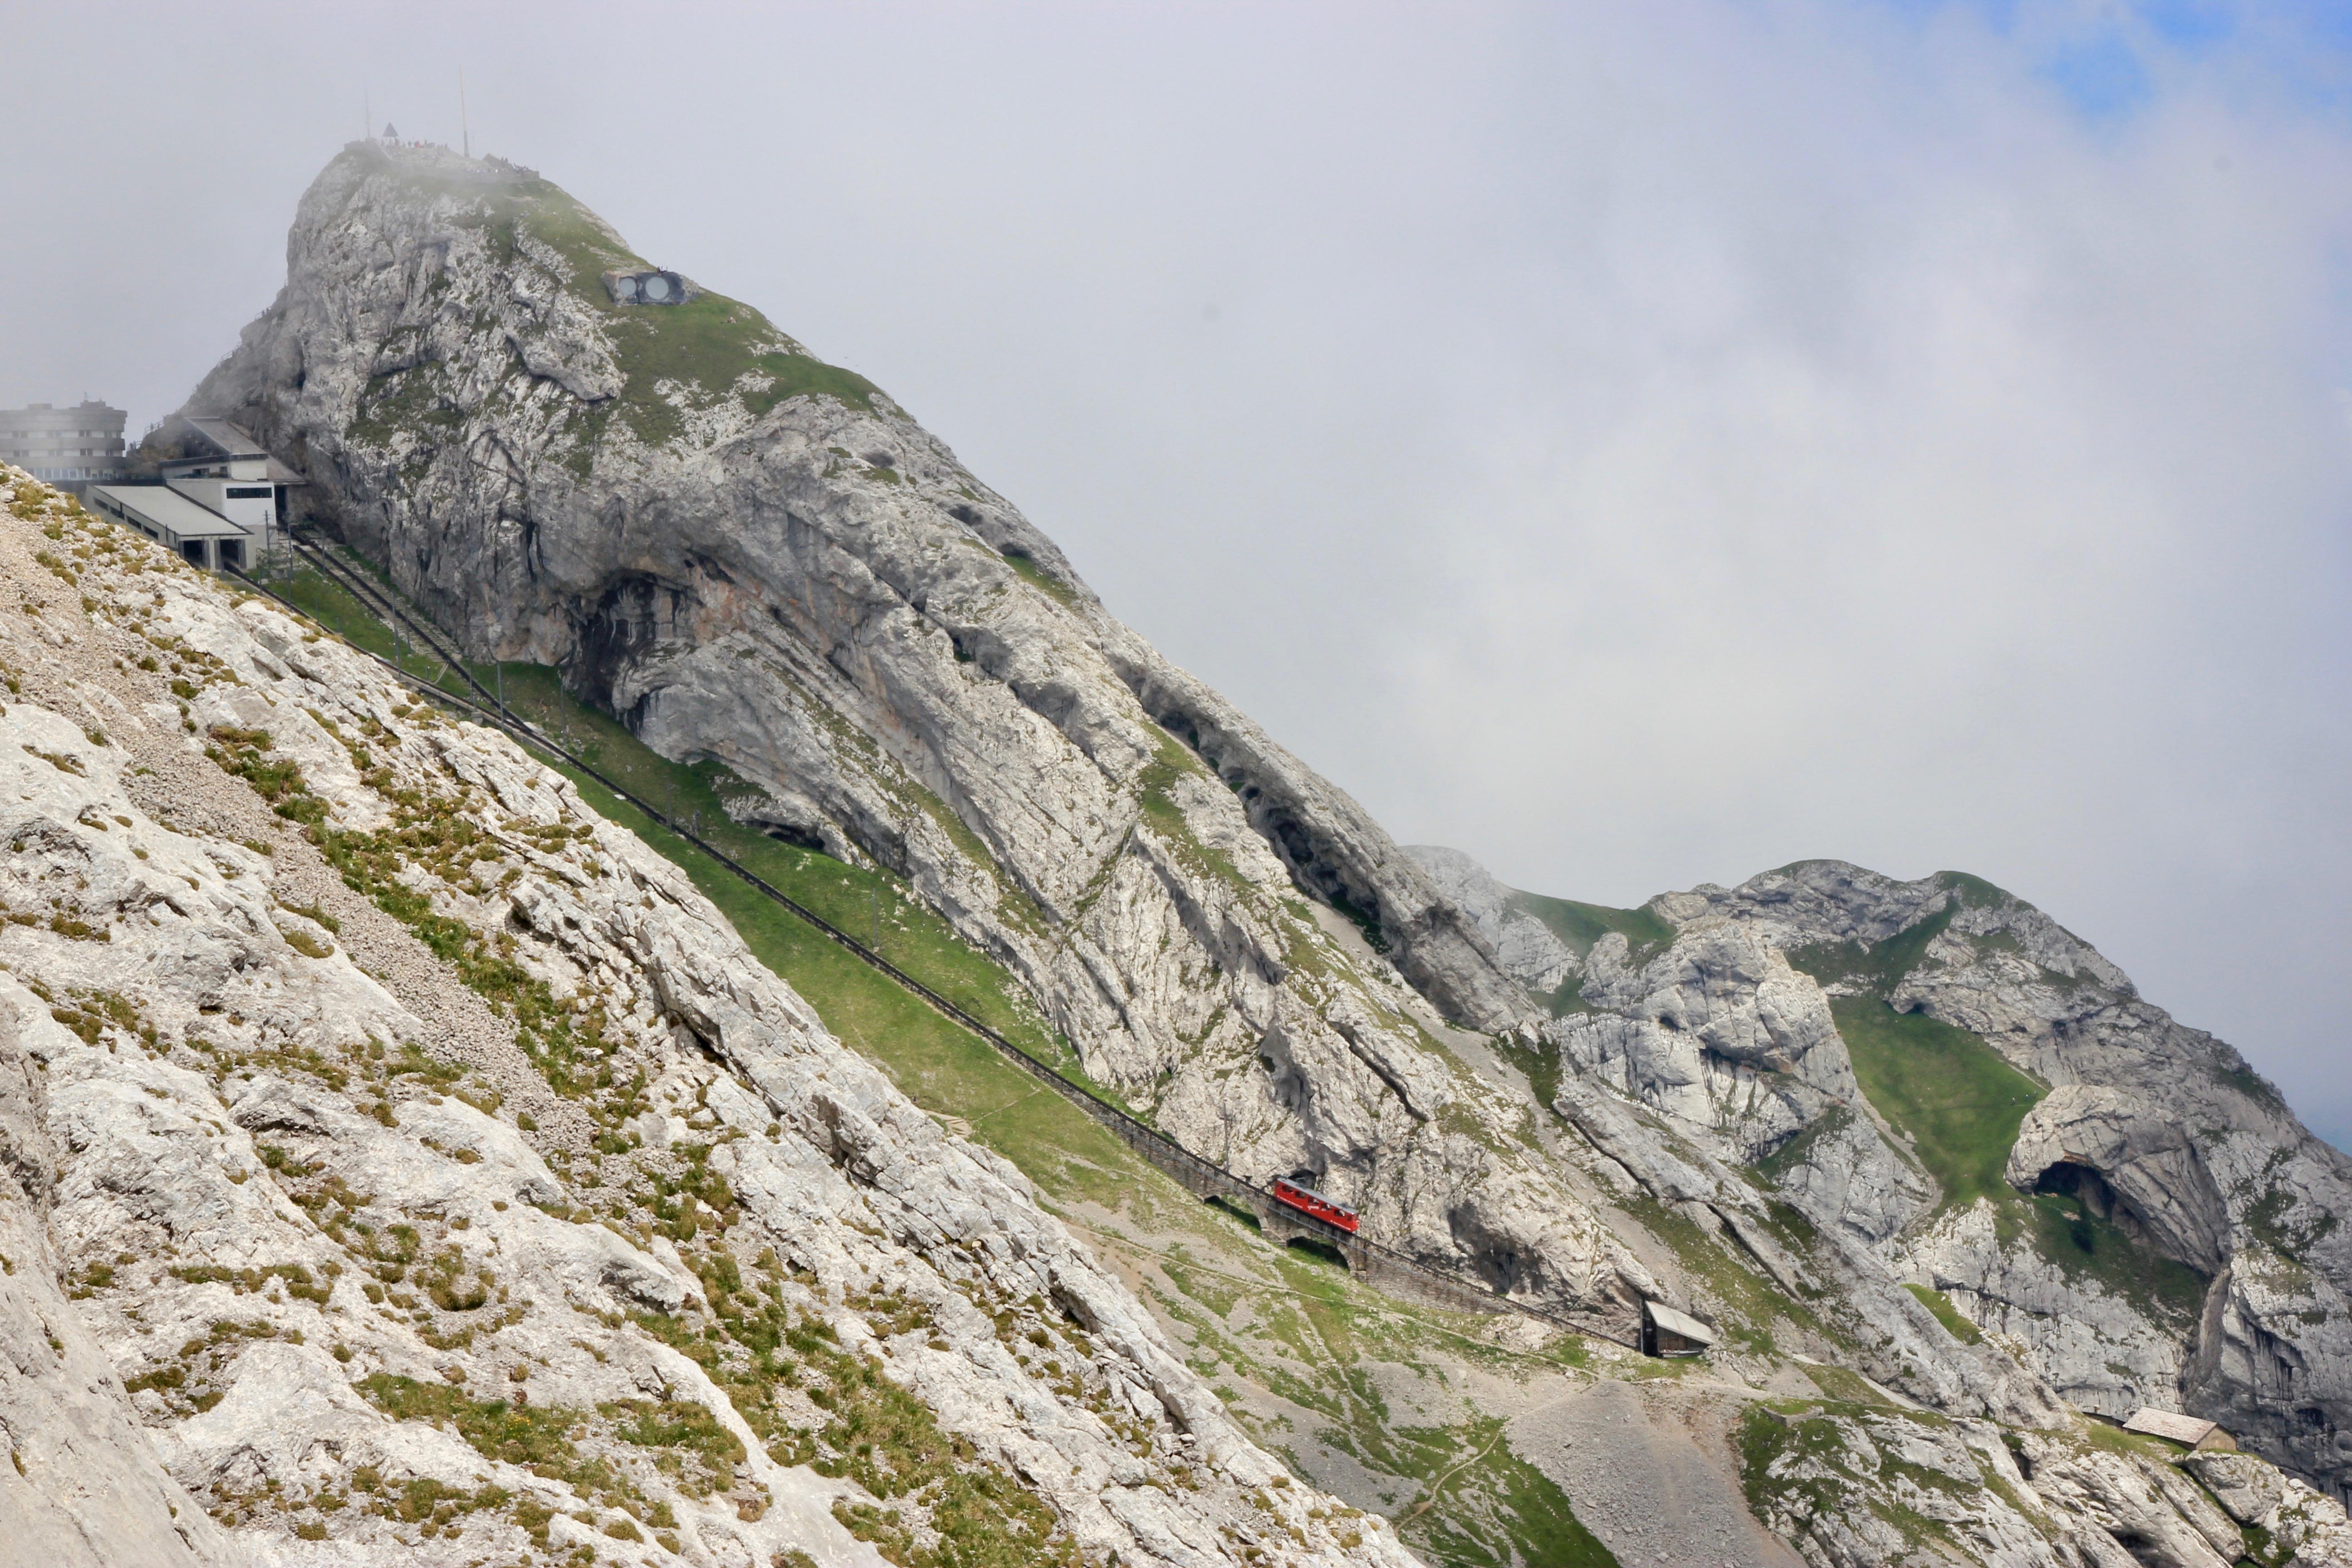 Anello d'oro, Monte Pilatus